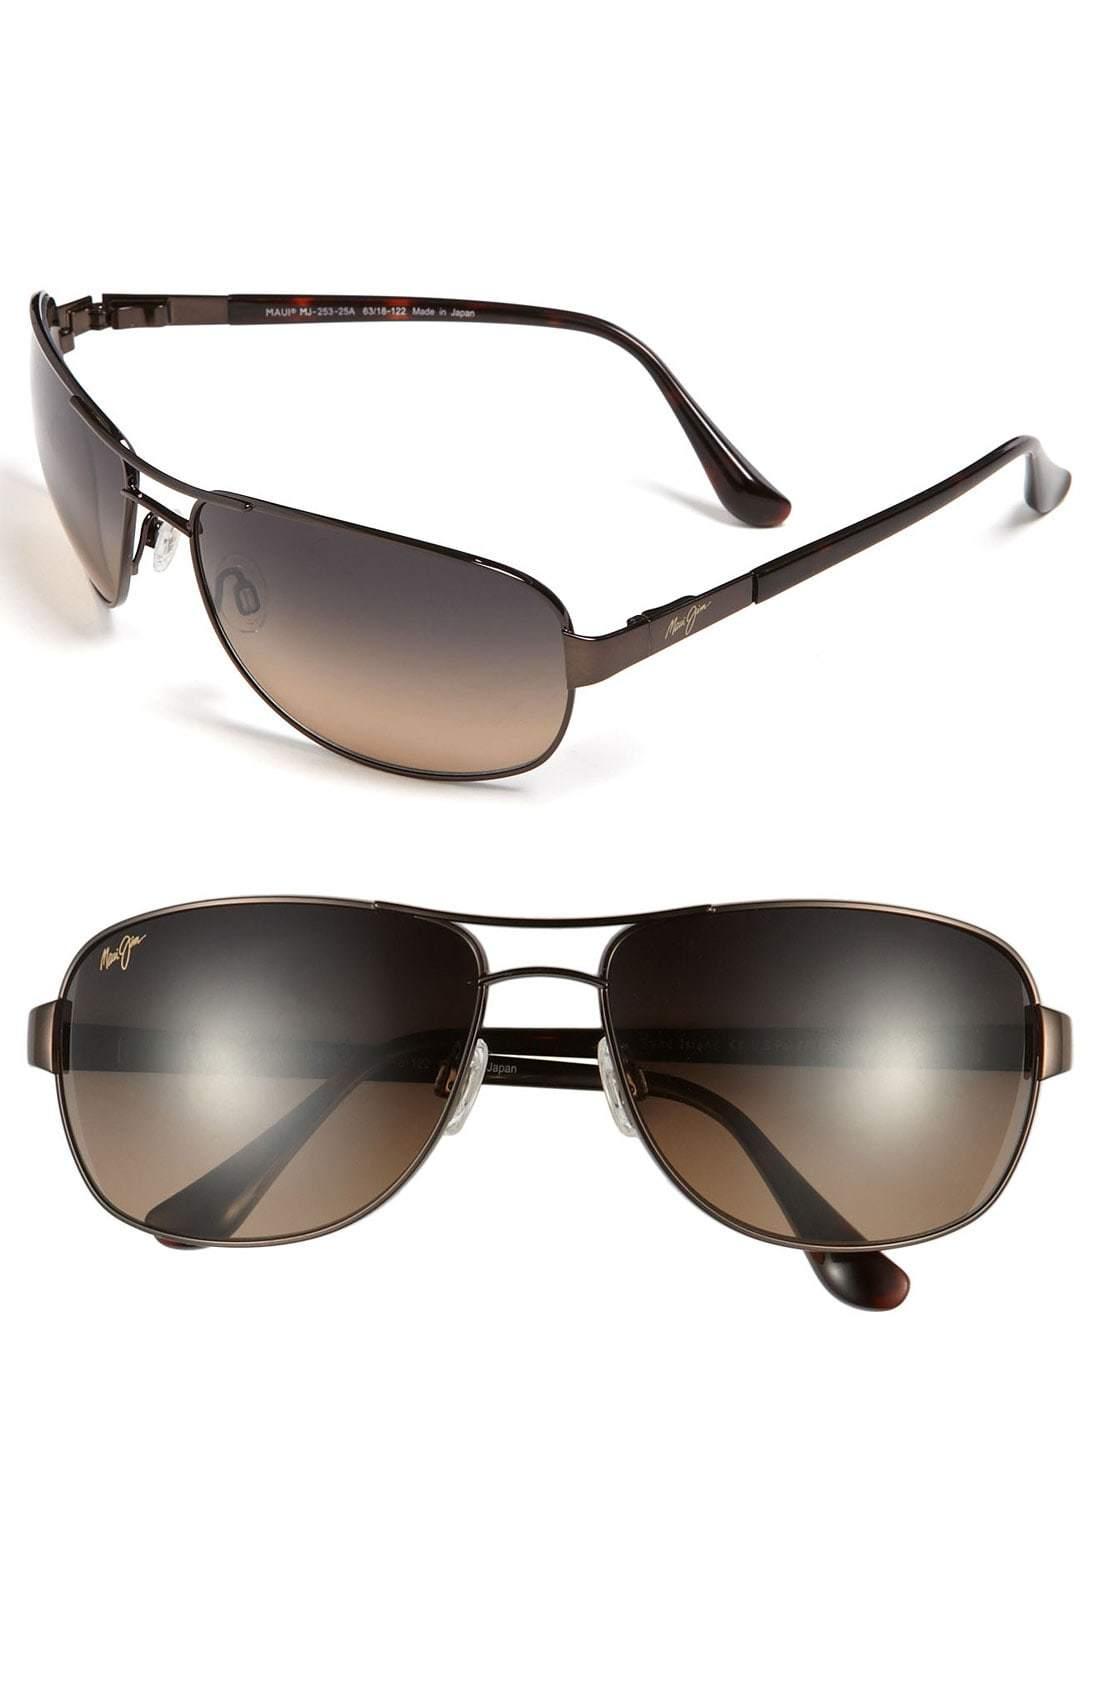 81bf956bed9 ... Dark Brown Sunglasses Maui Jim Sand Island Polarizedplus2 63mm  Sunglasses